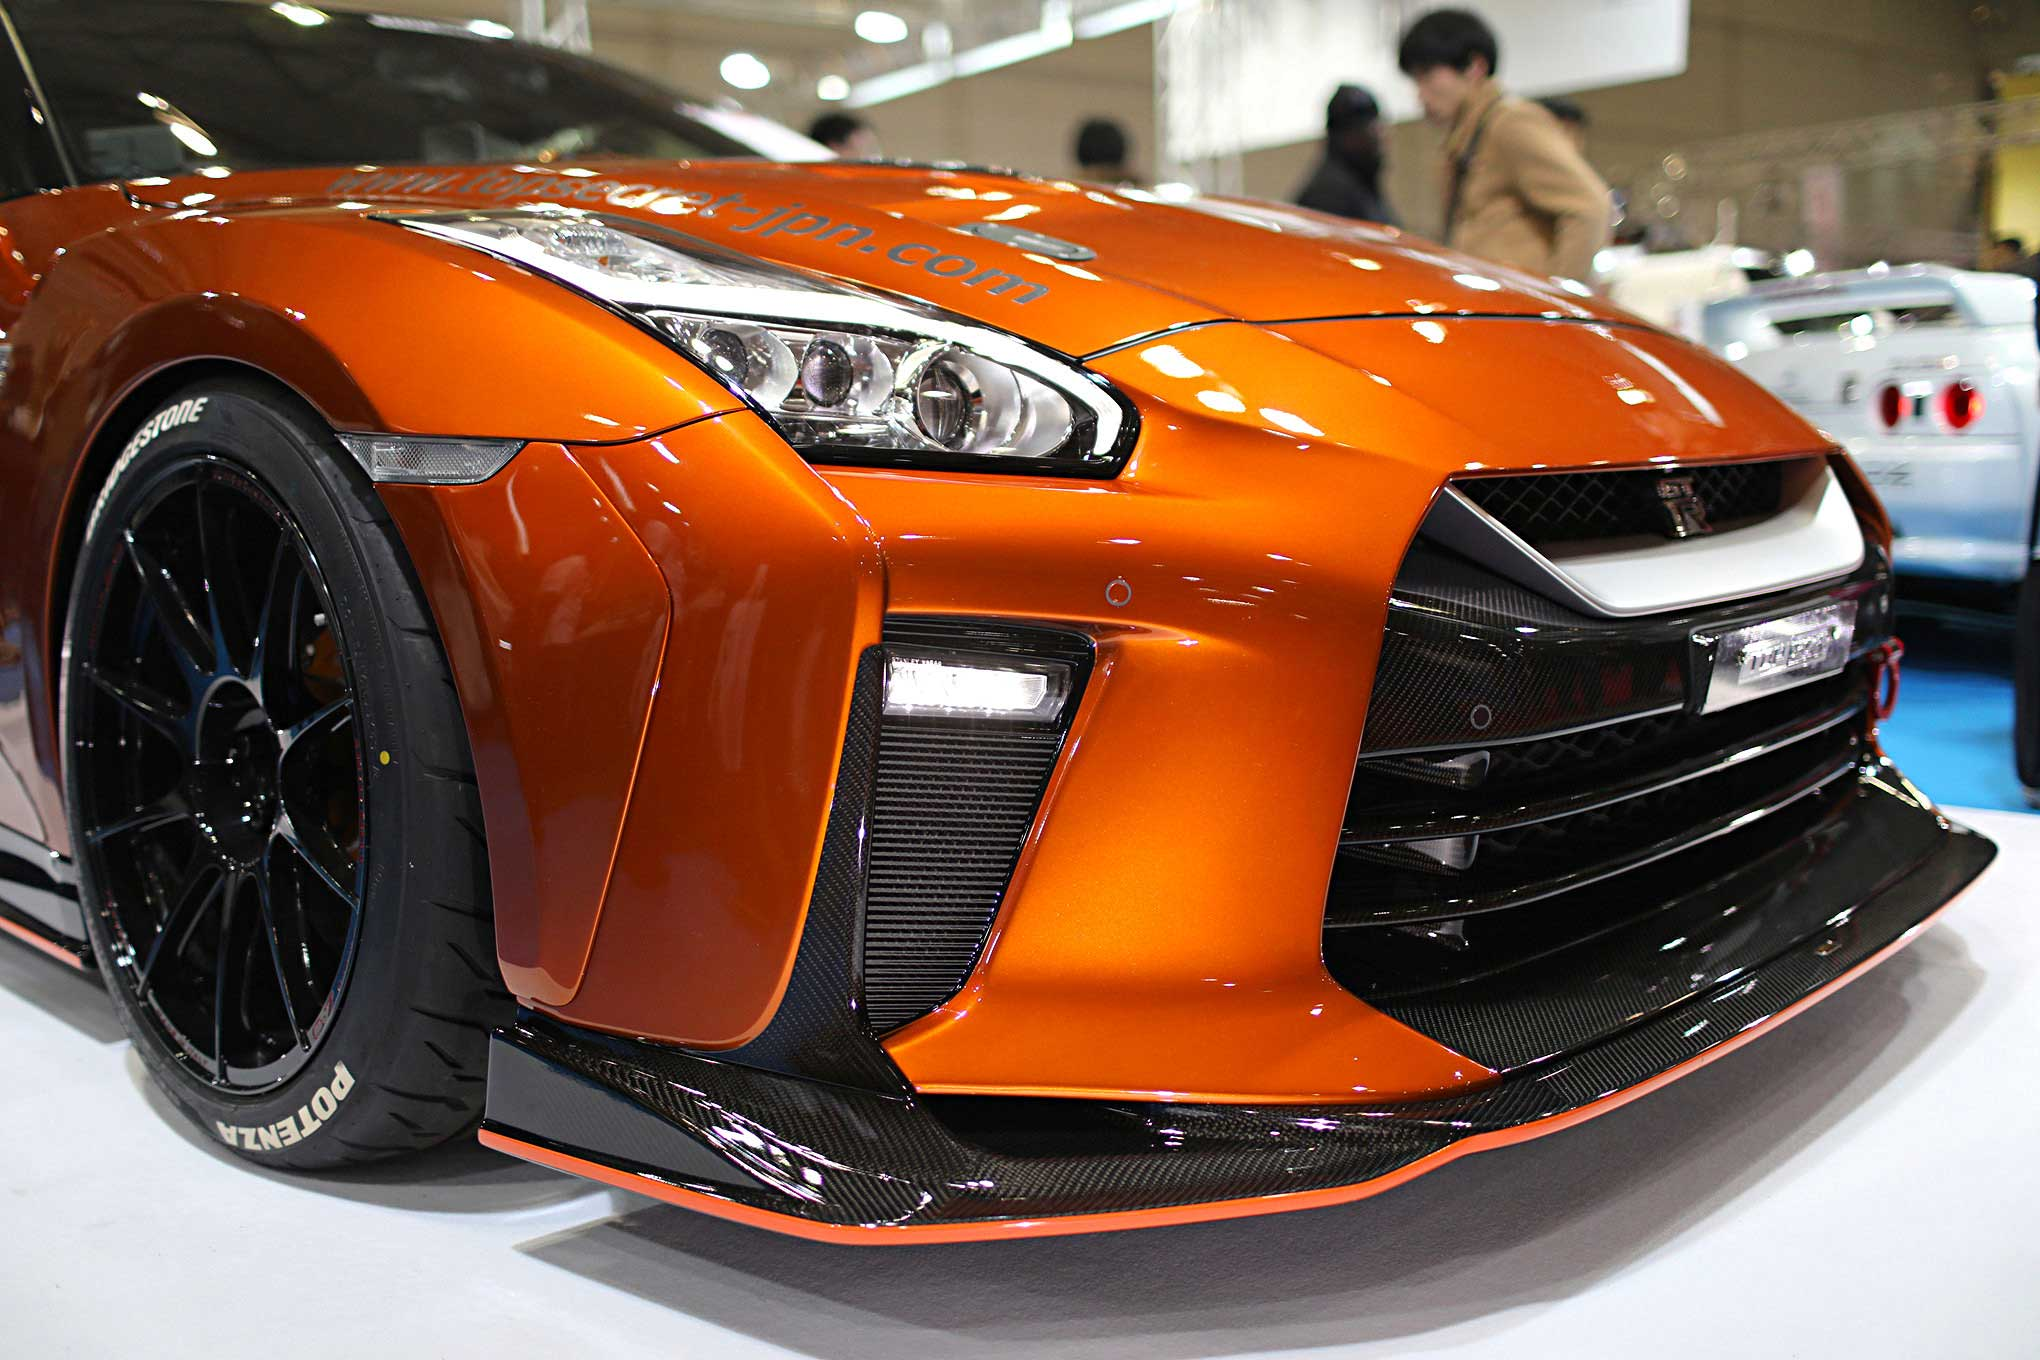 Tokyo Auto Salon 2018 Spotlight: Top Secret's Nissan R35